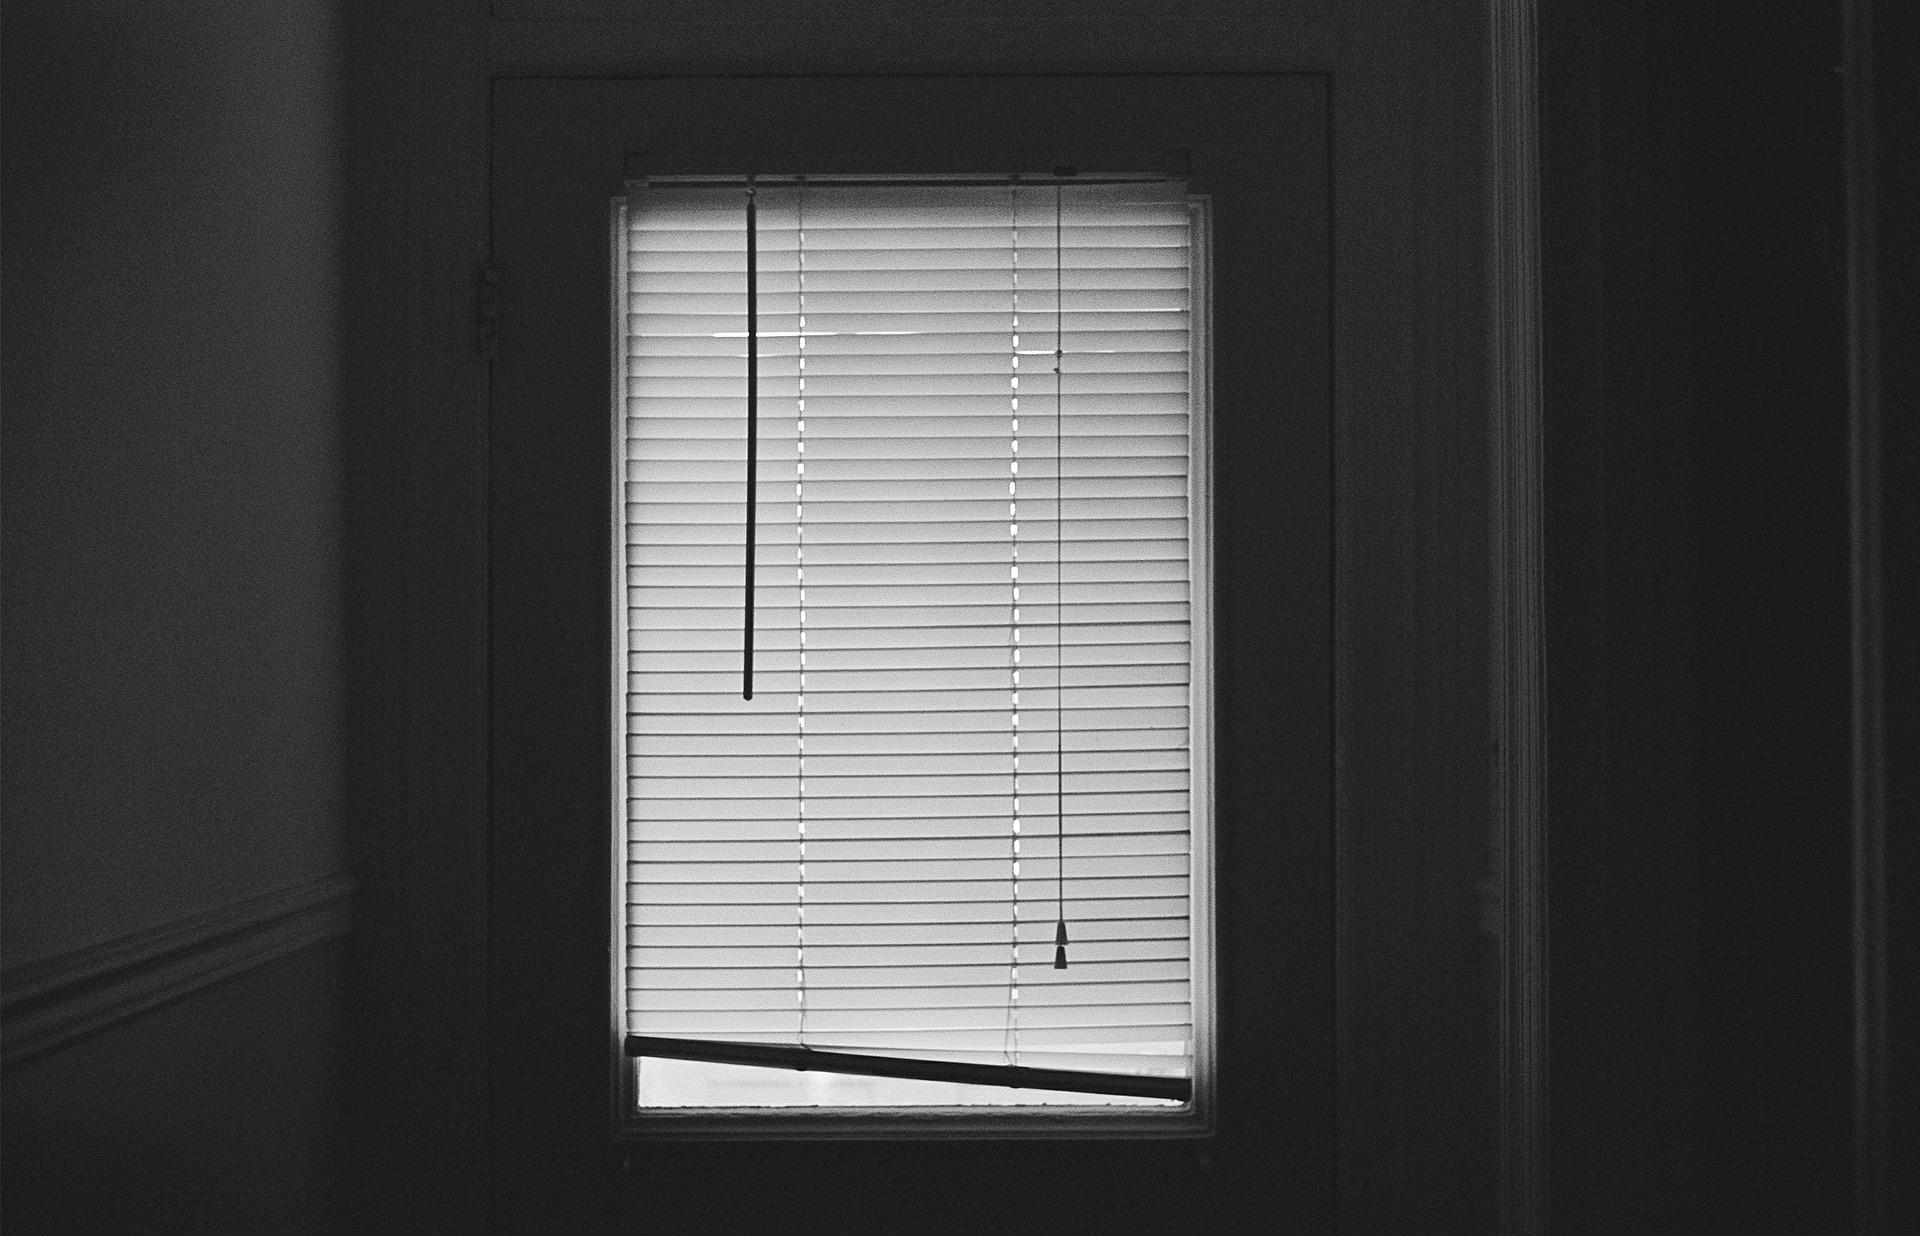 blinds-407025_1920